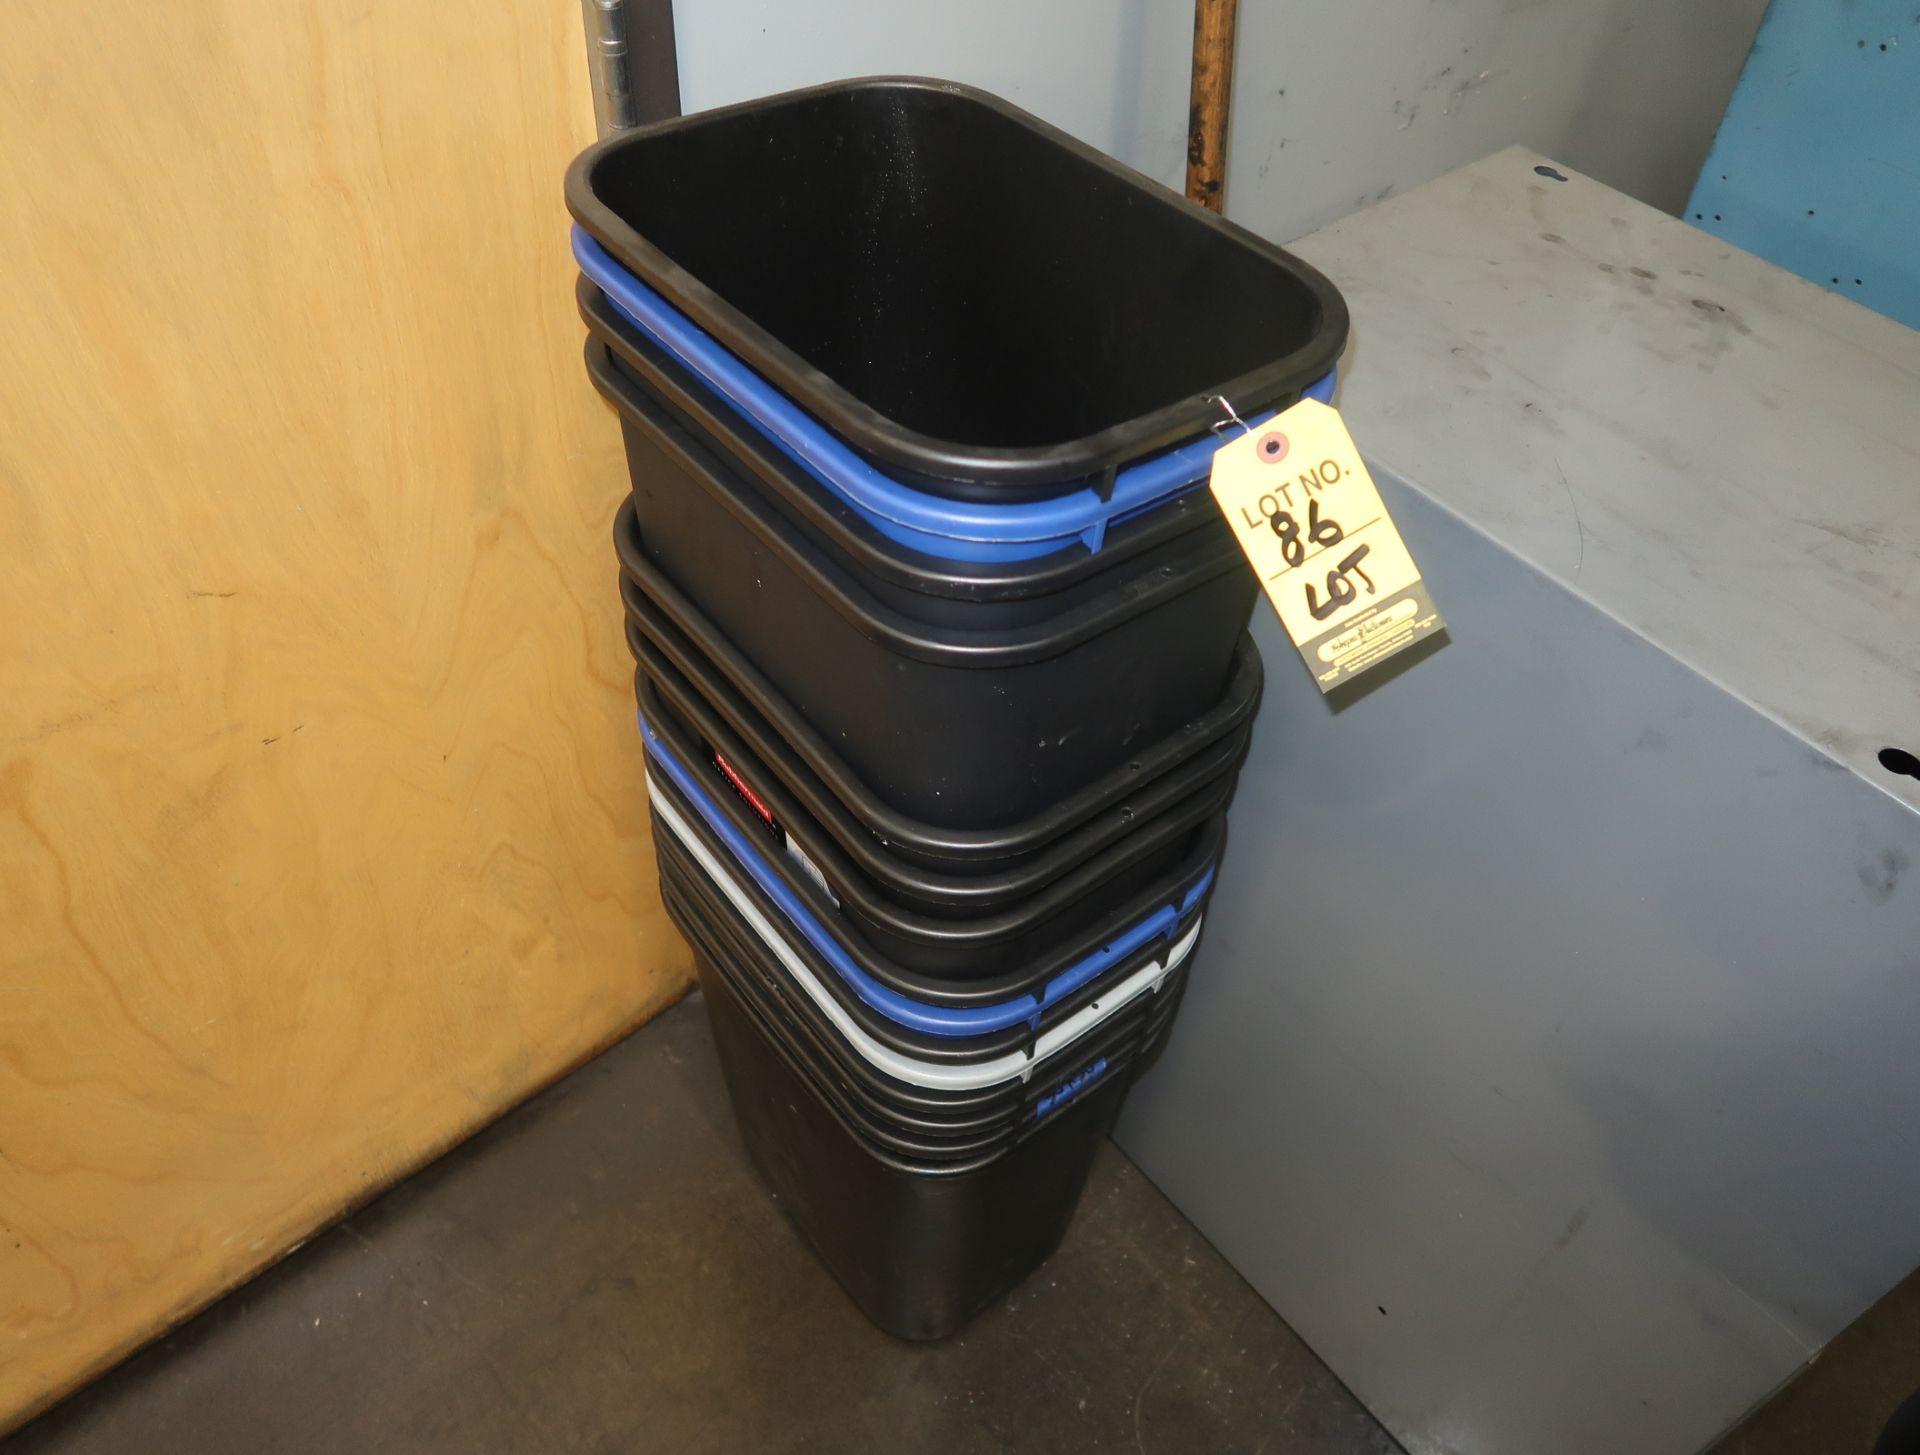 Lot 86 - LOT TRASH CANS